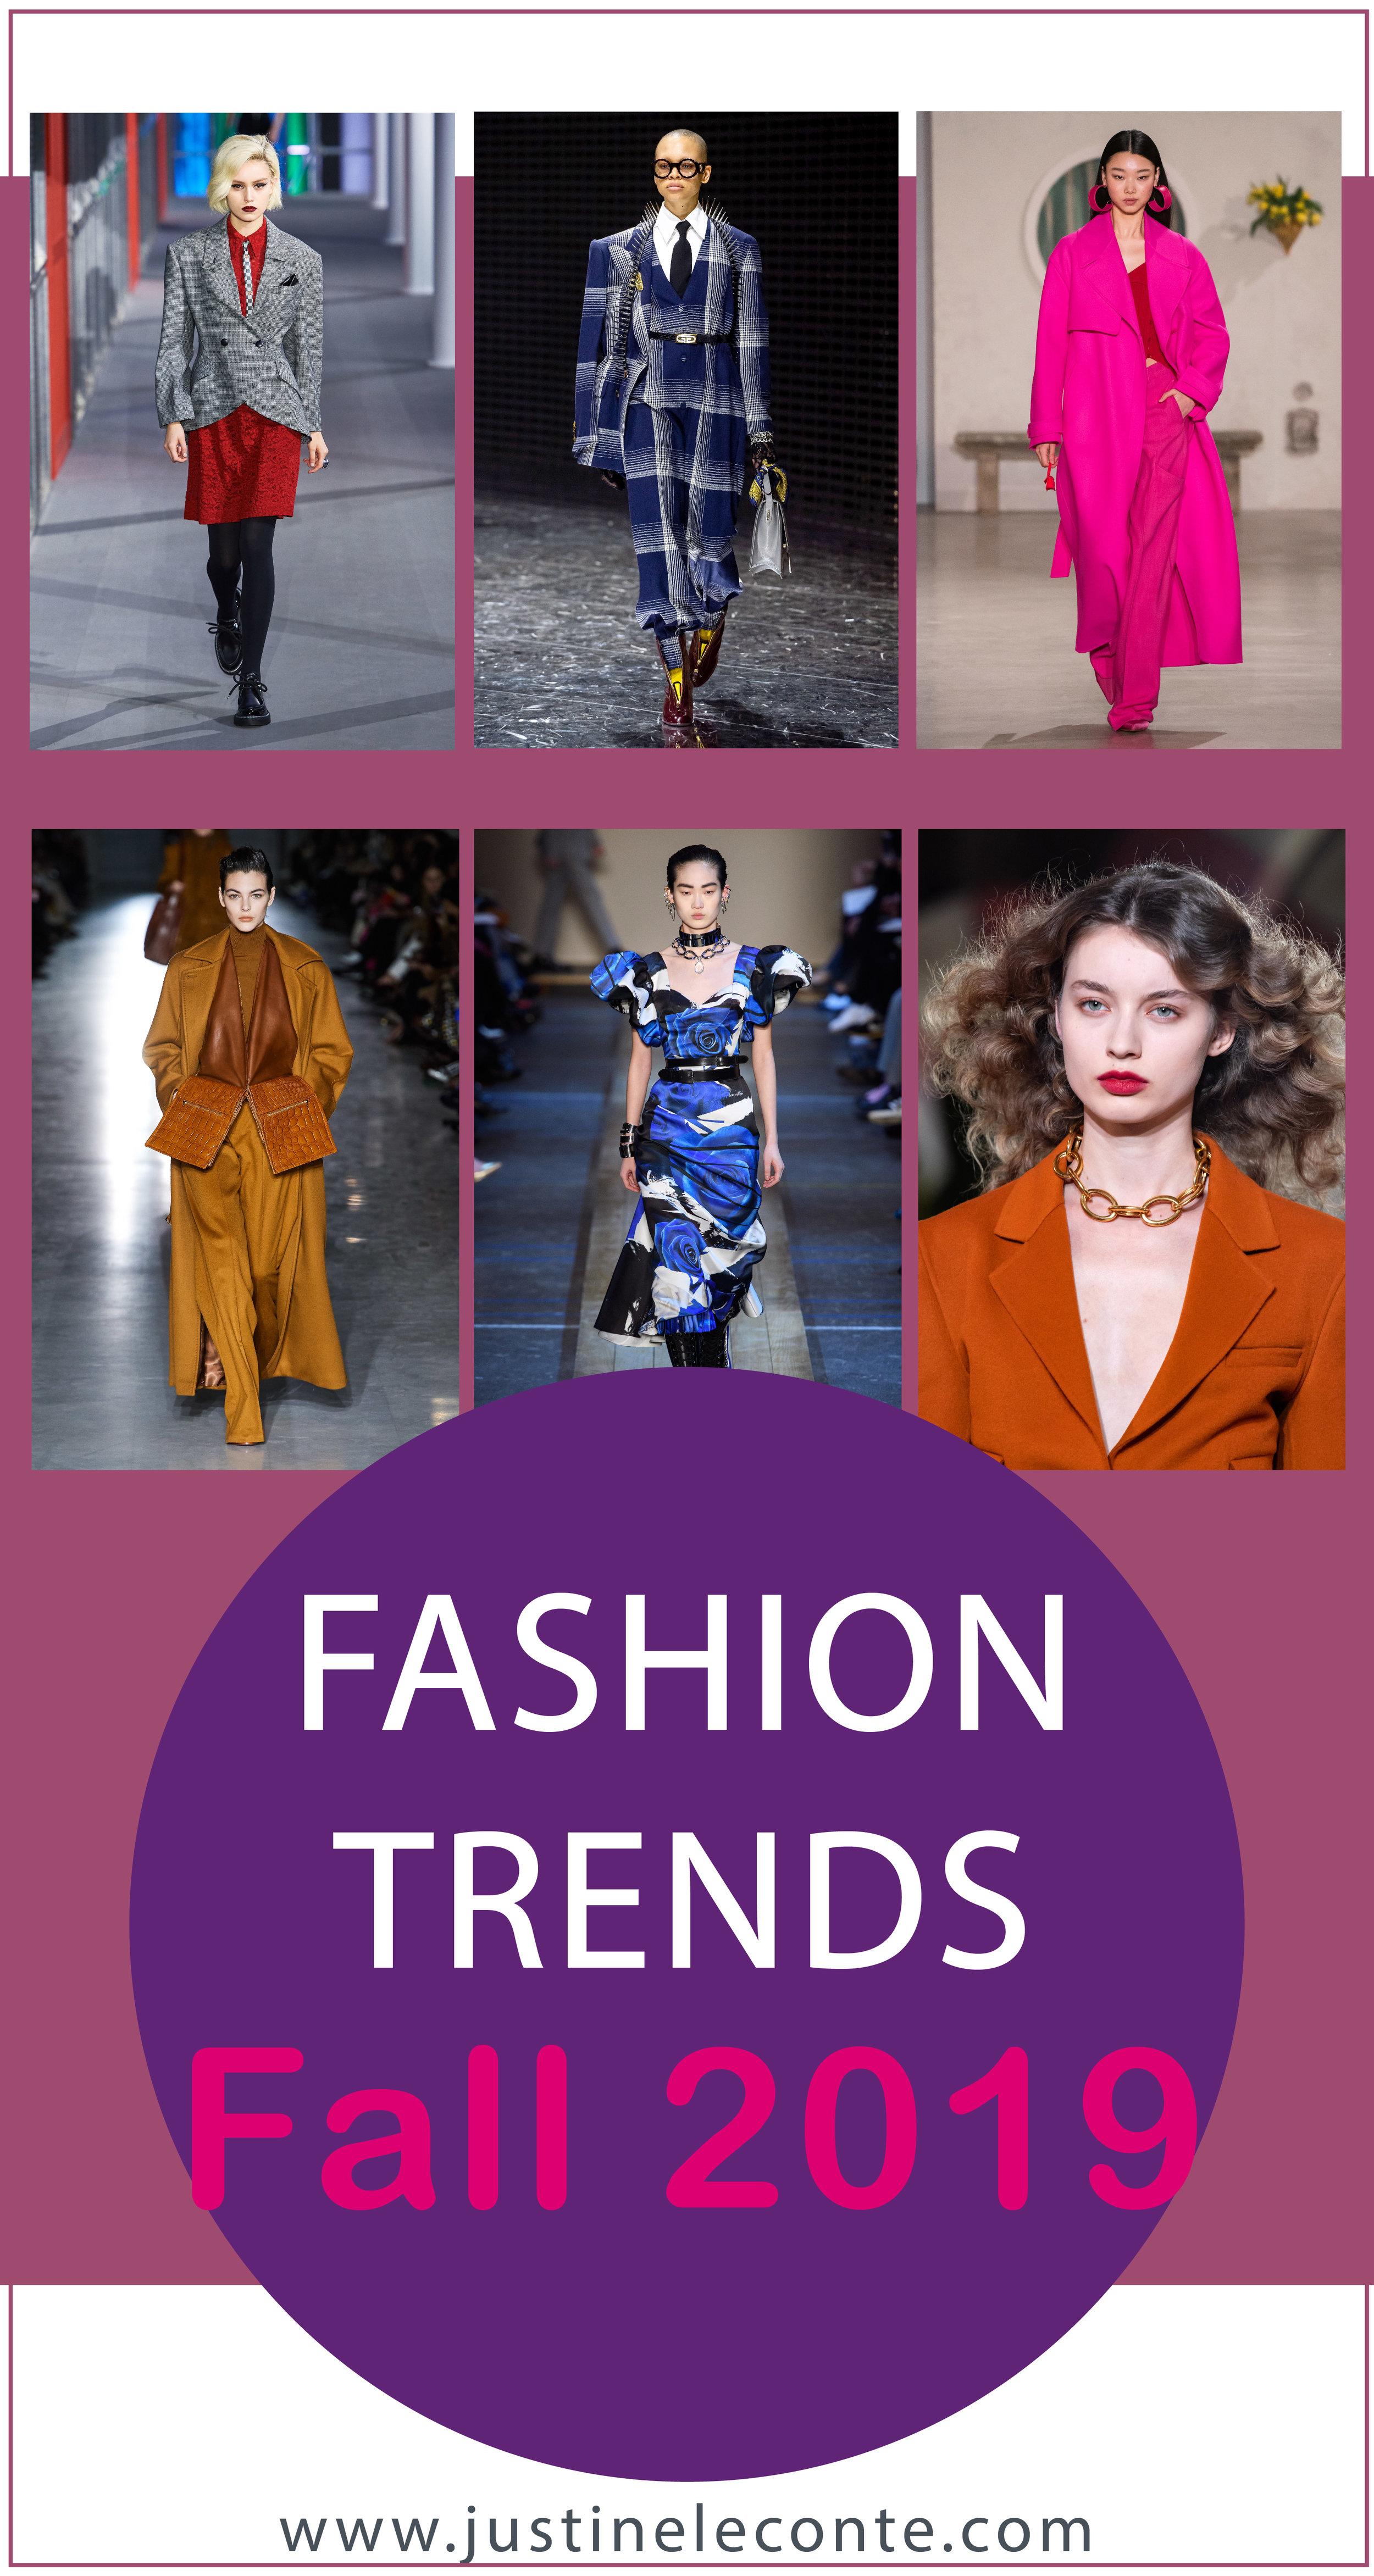 20190905_Fashion-trends-fall-winter-2019_Justine-Leconte-01.jpg